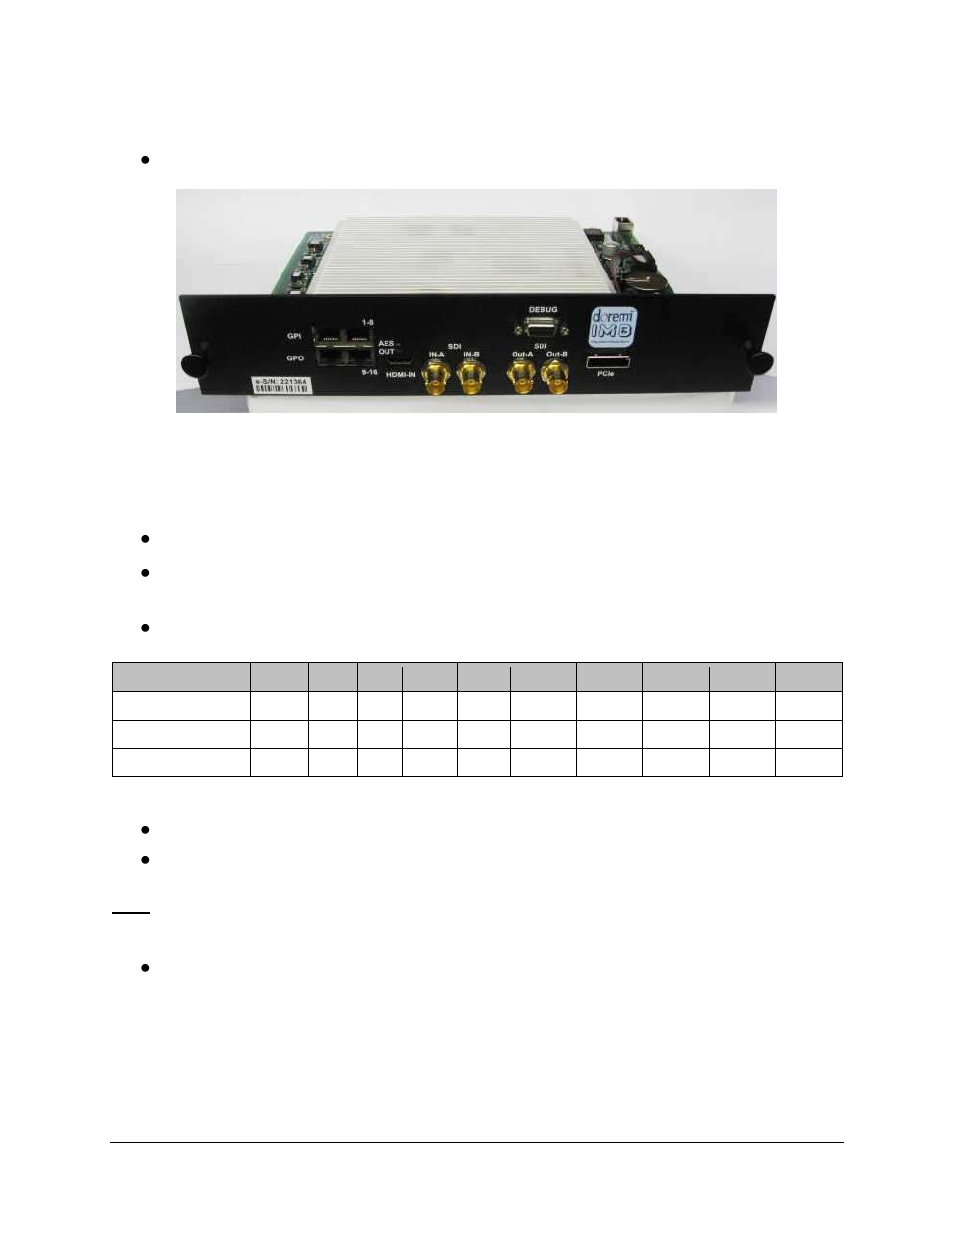 3 imb board installation proce...